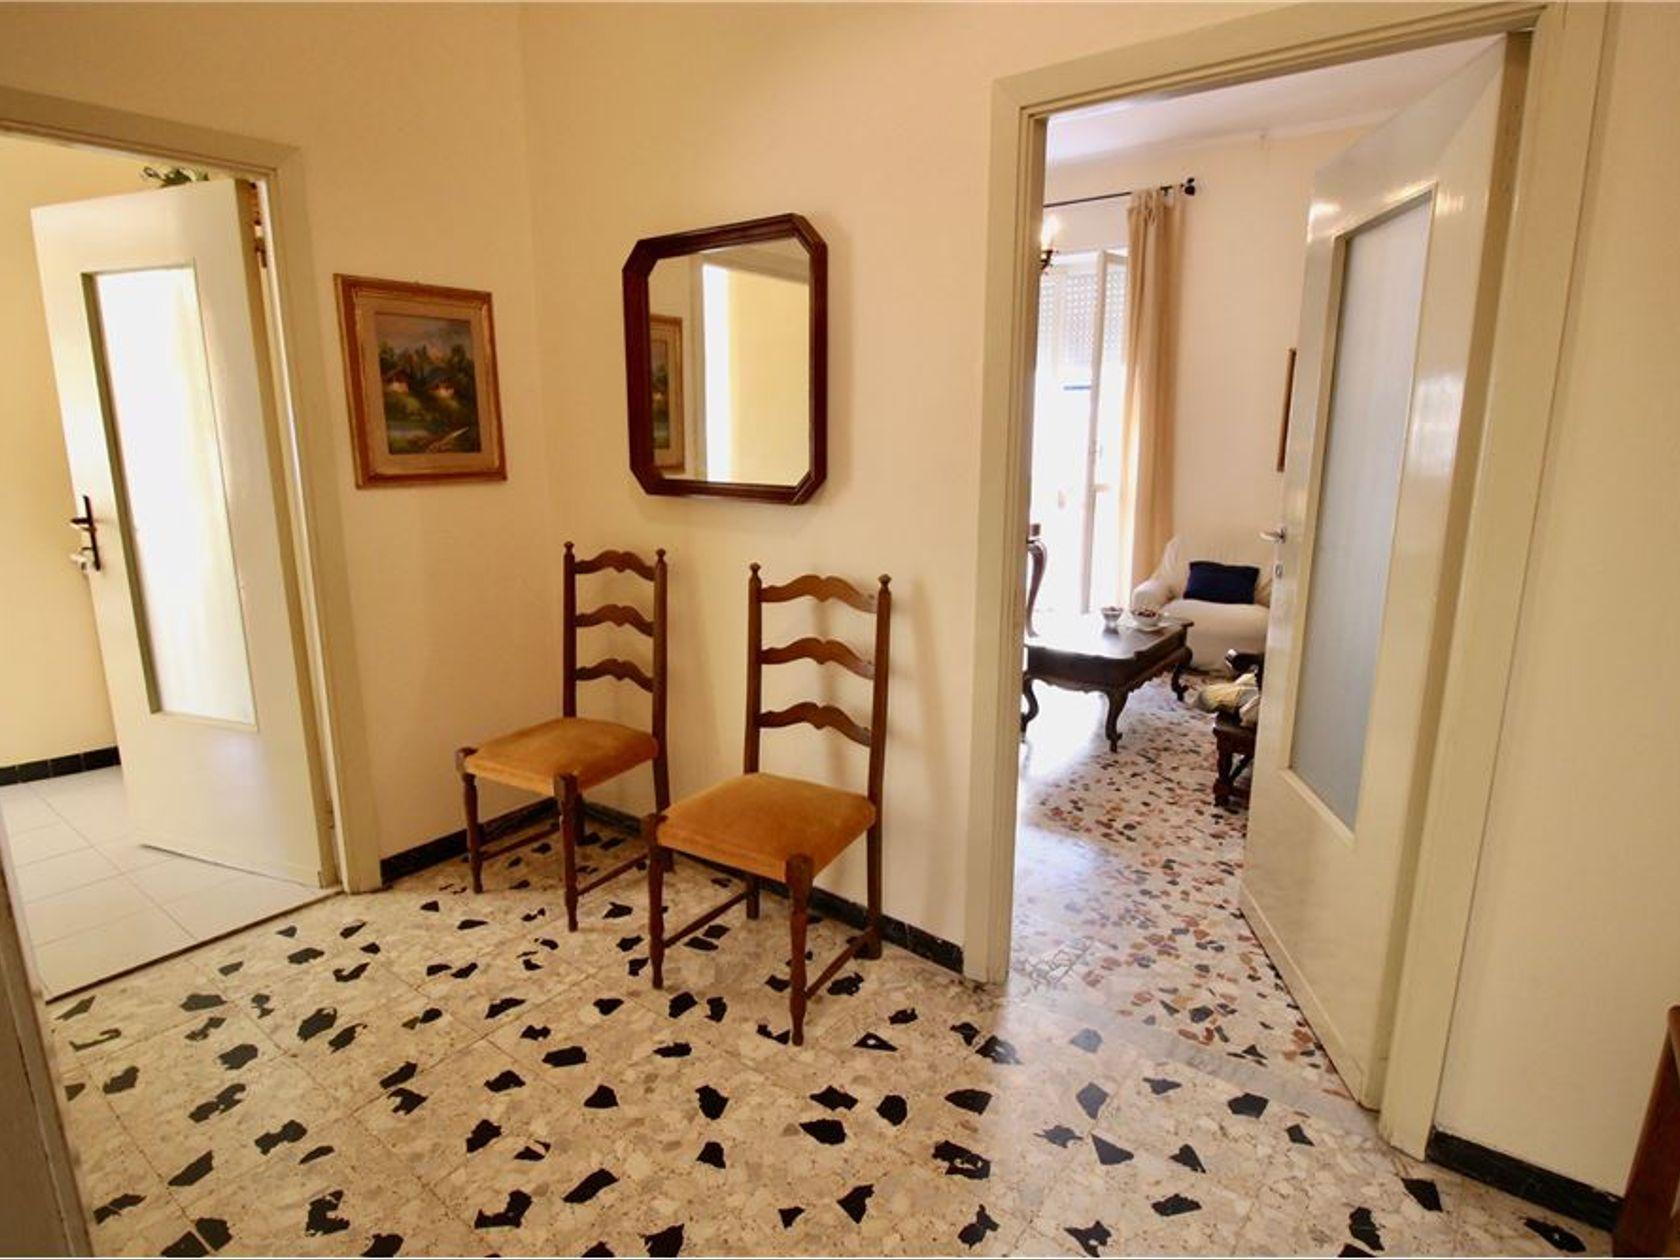 Appartamento Ss-centro, Sassari, SS Vendita - Foto 2